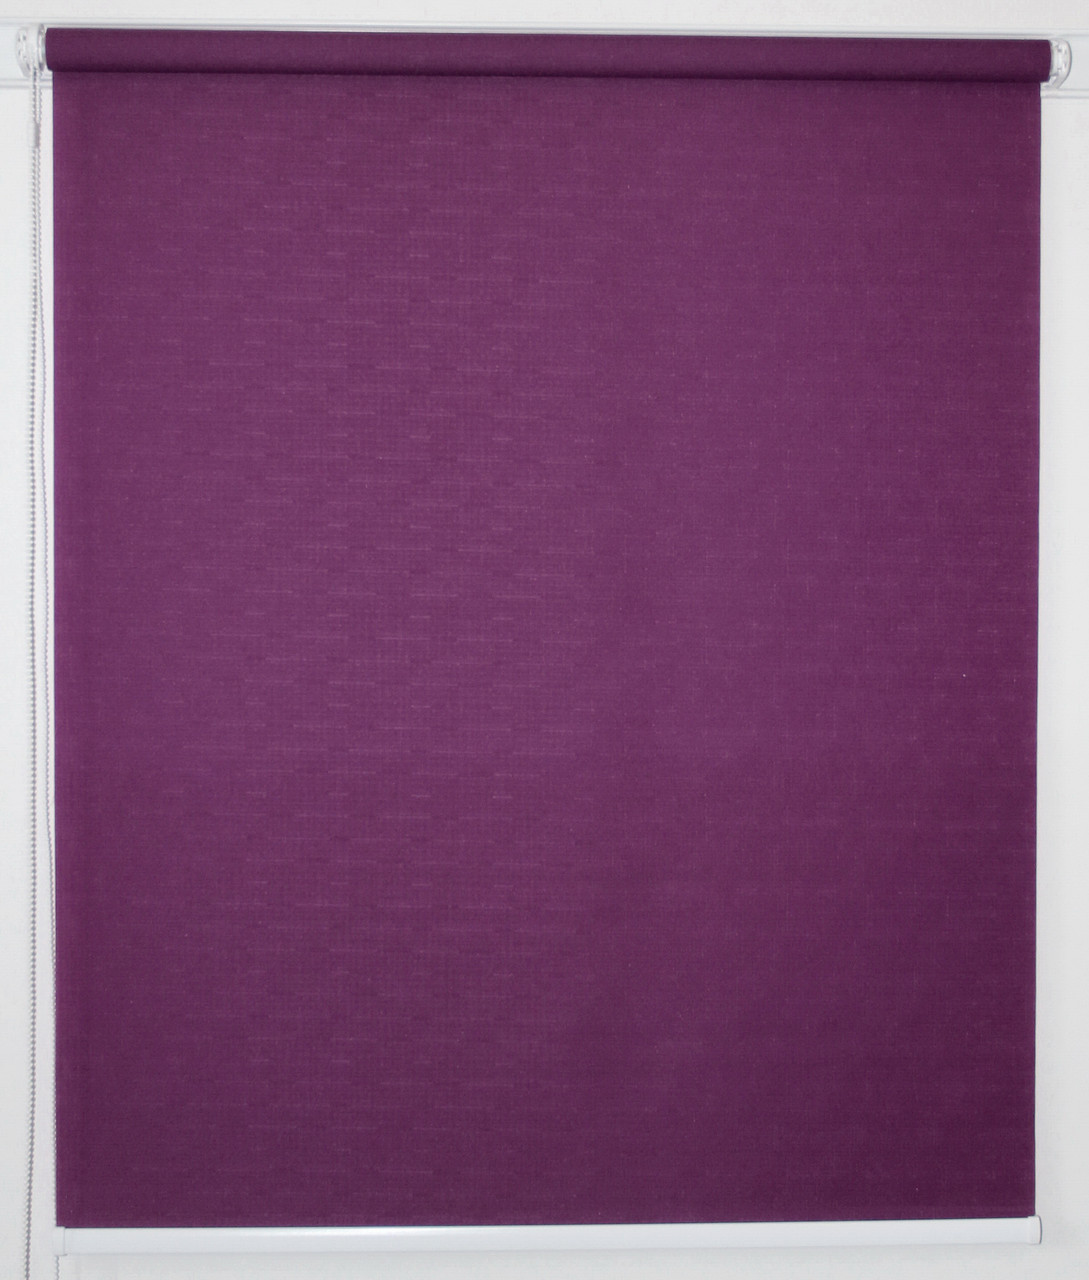 Рулонная штора 375*1500 Лён 613 Фиолетовый